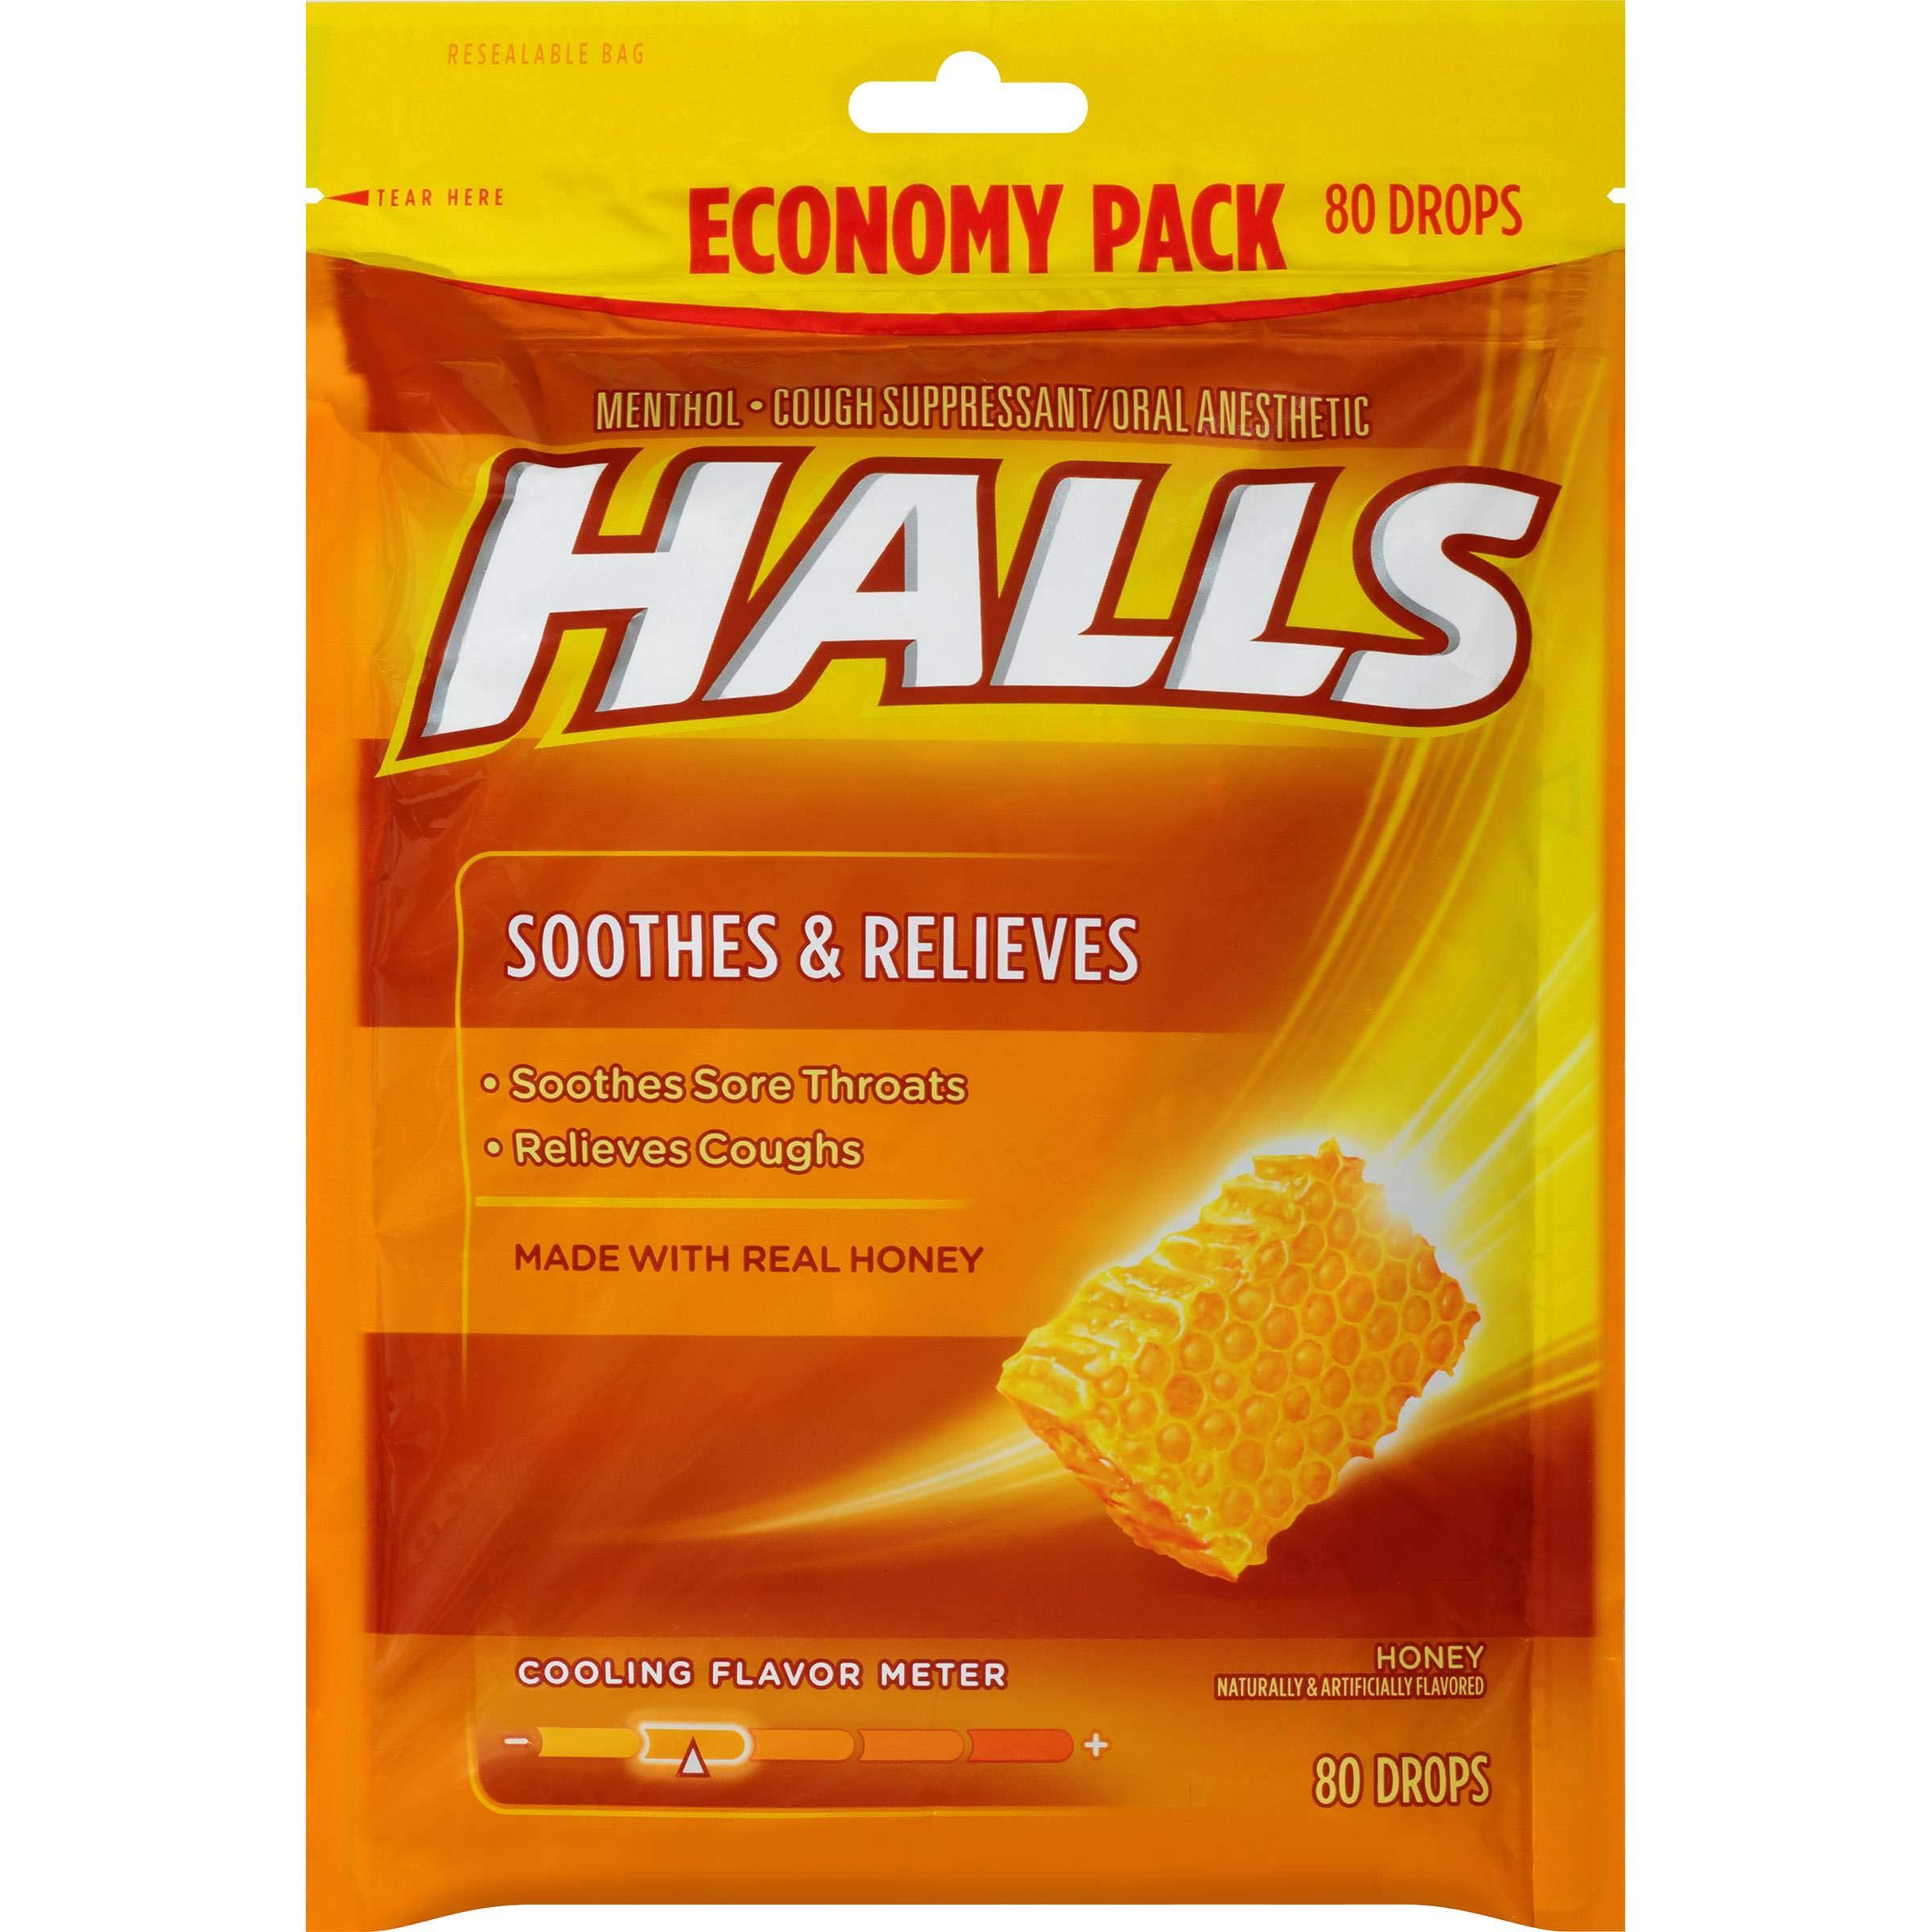 Halls Honey Cough Drops - with Menthol - 960 Drops (12 bags of 80 drops) by Halls